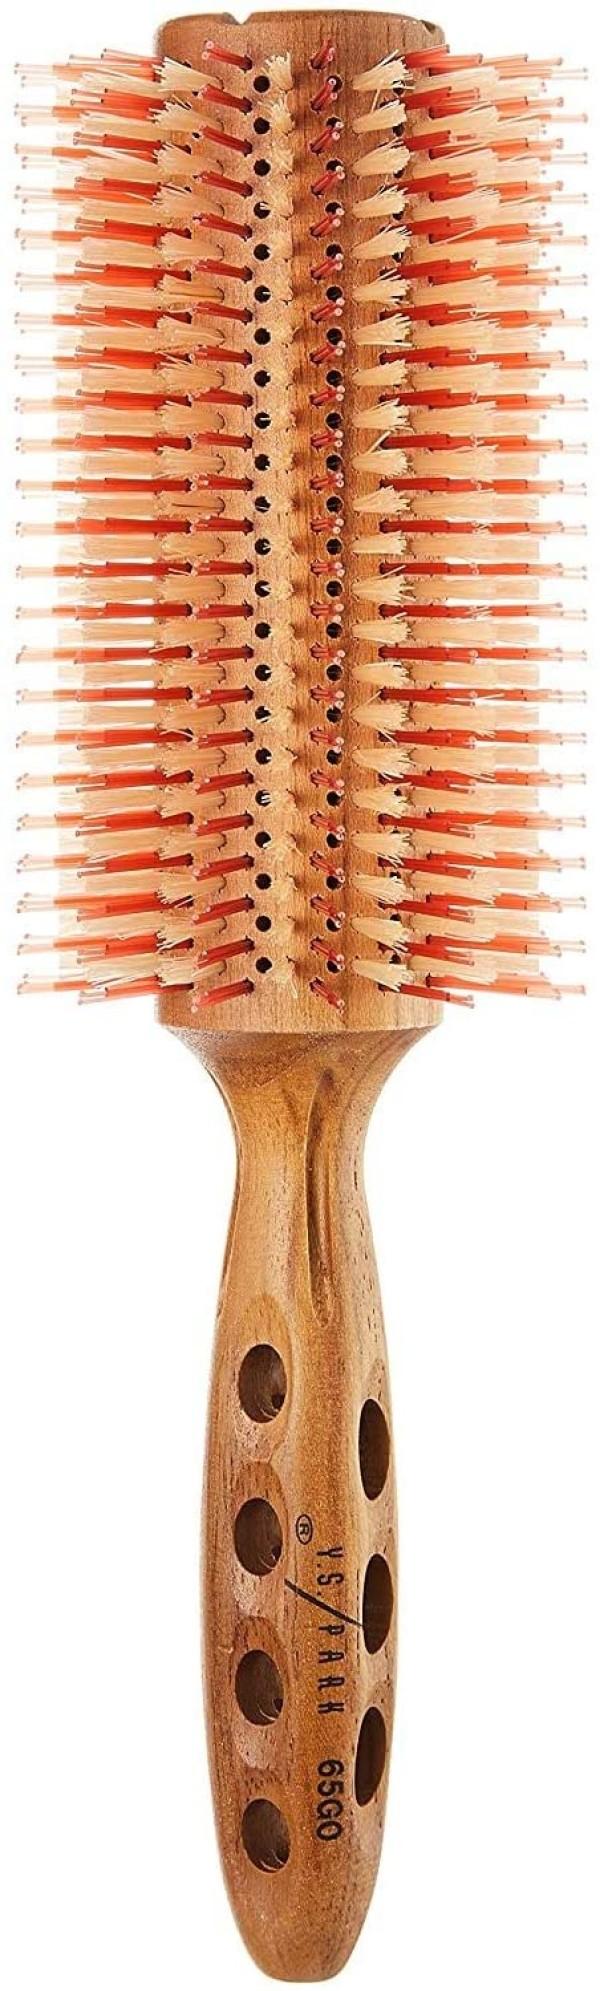 Брашинг Y.S.Park Professional Super G Series Hairbrush